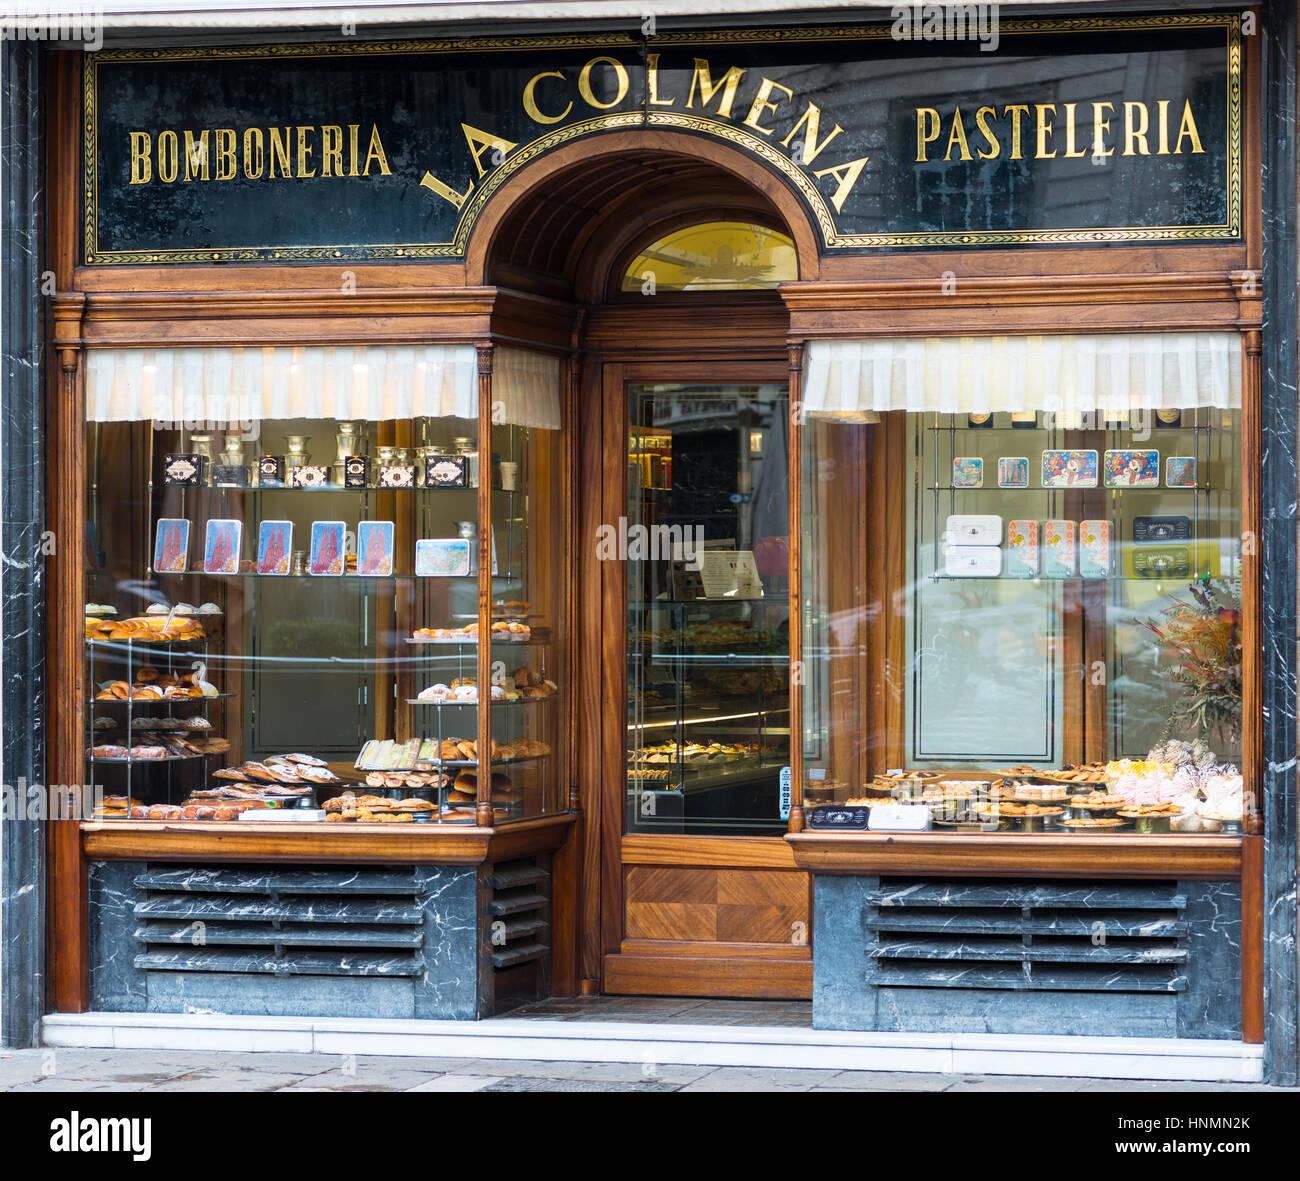 Pastry Shop Street Scene Stock Photos & Pastry Shop Street Scene Stock Images